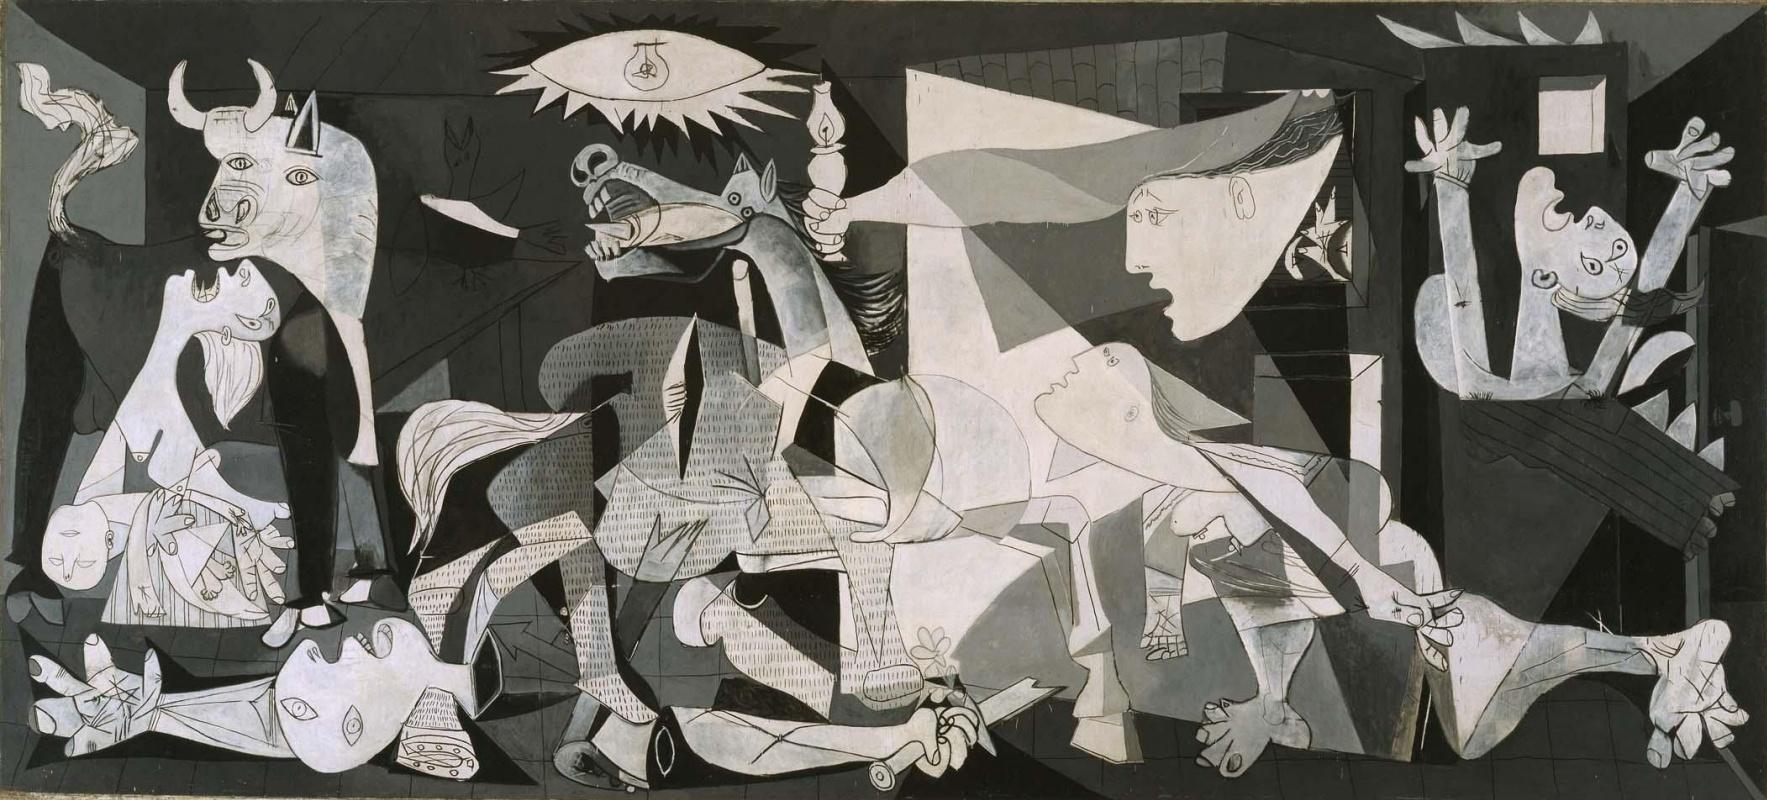 Pablo Picasso. Guernica